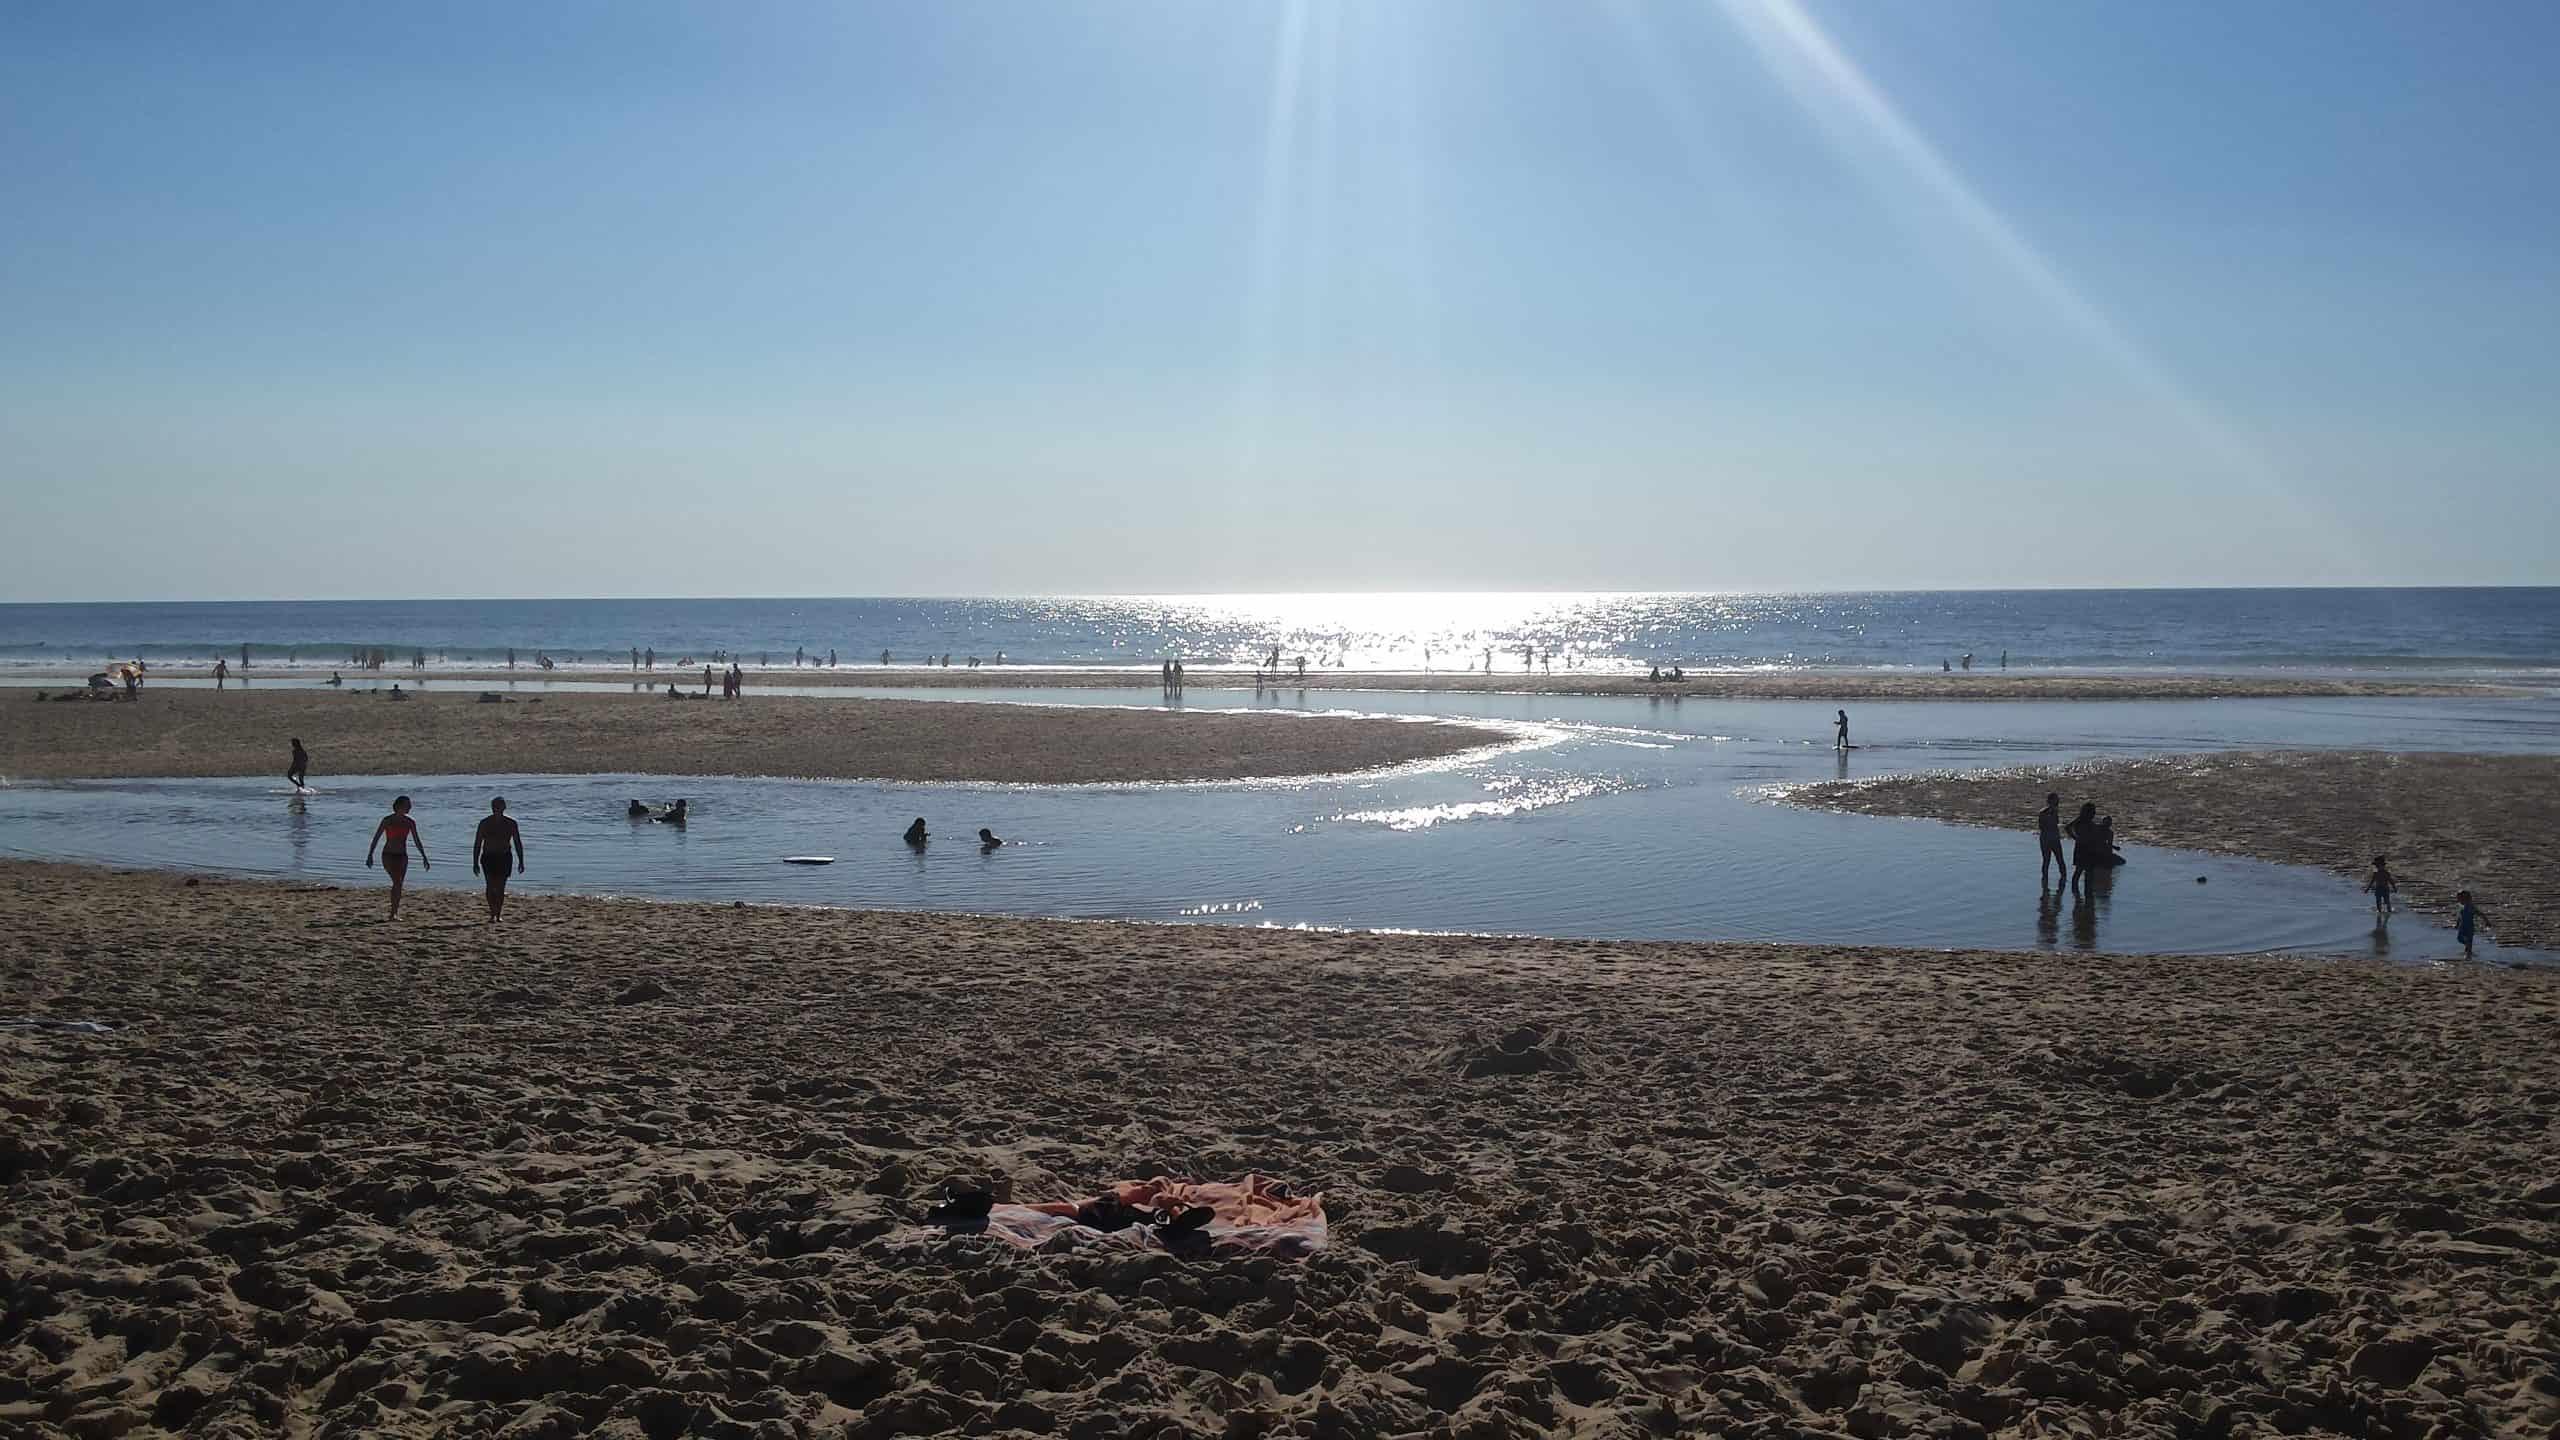 location de vacances sur le bassin d'arcachon proche océan surf château sable coquillage skimboard bodyboard